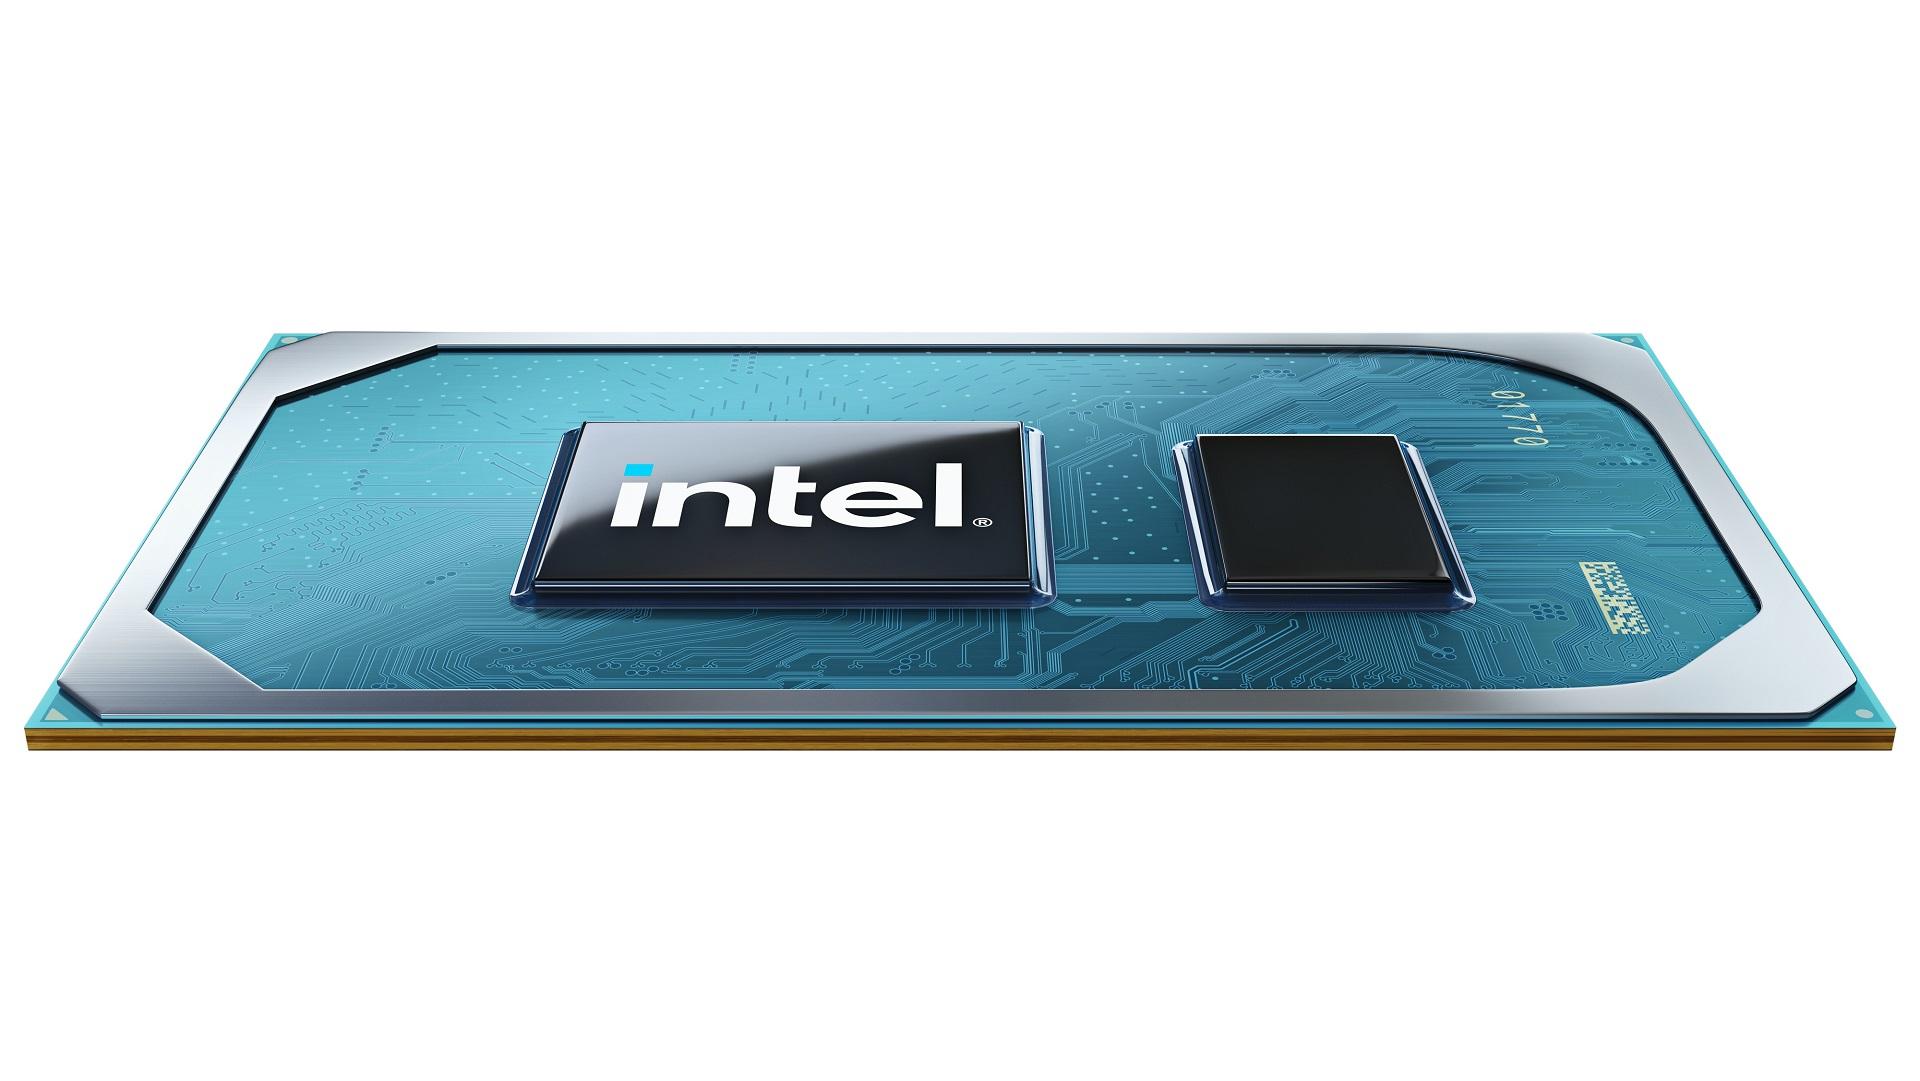 11th Gen Intel Core processors with Intel Iris Xe graphics_v2